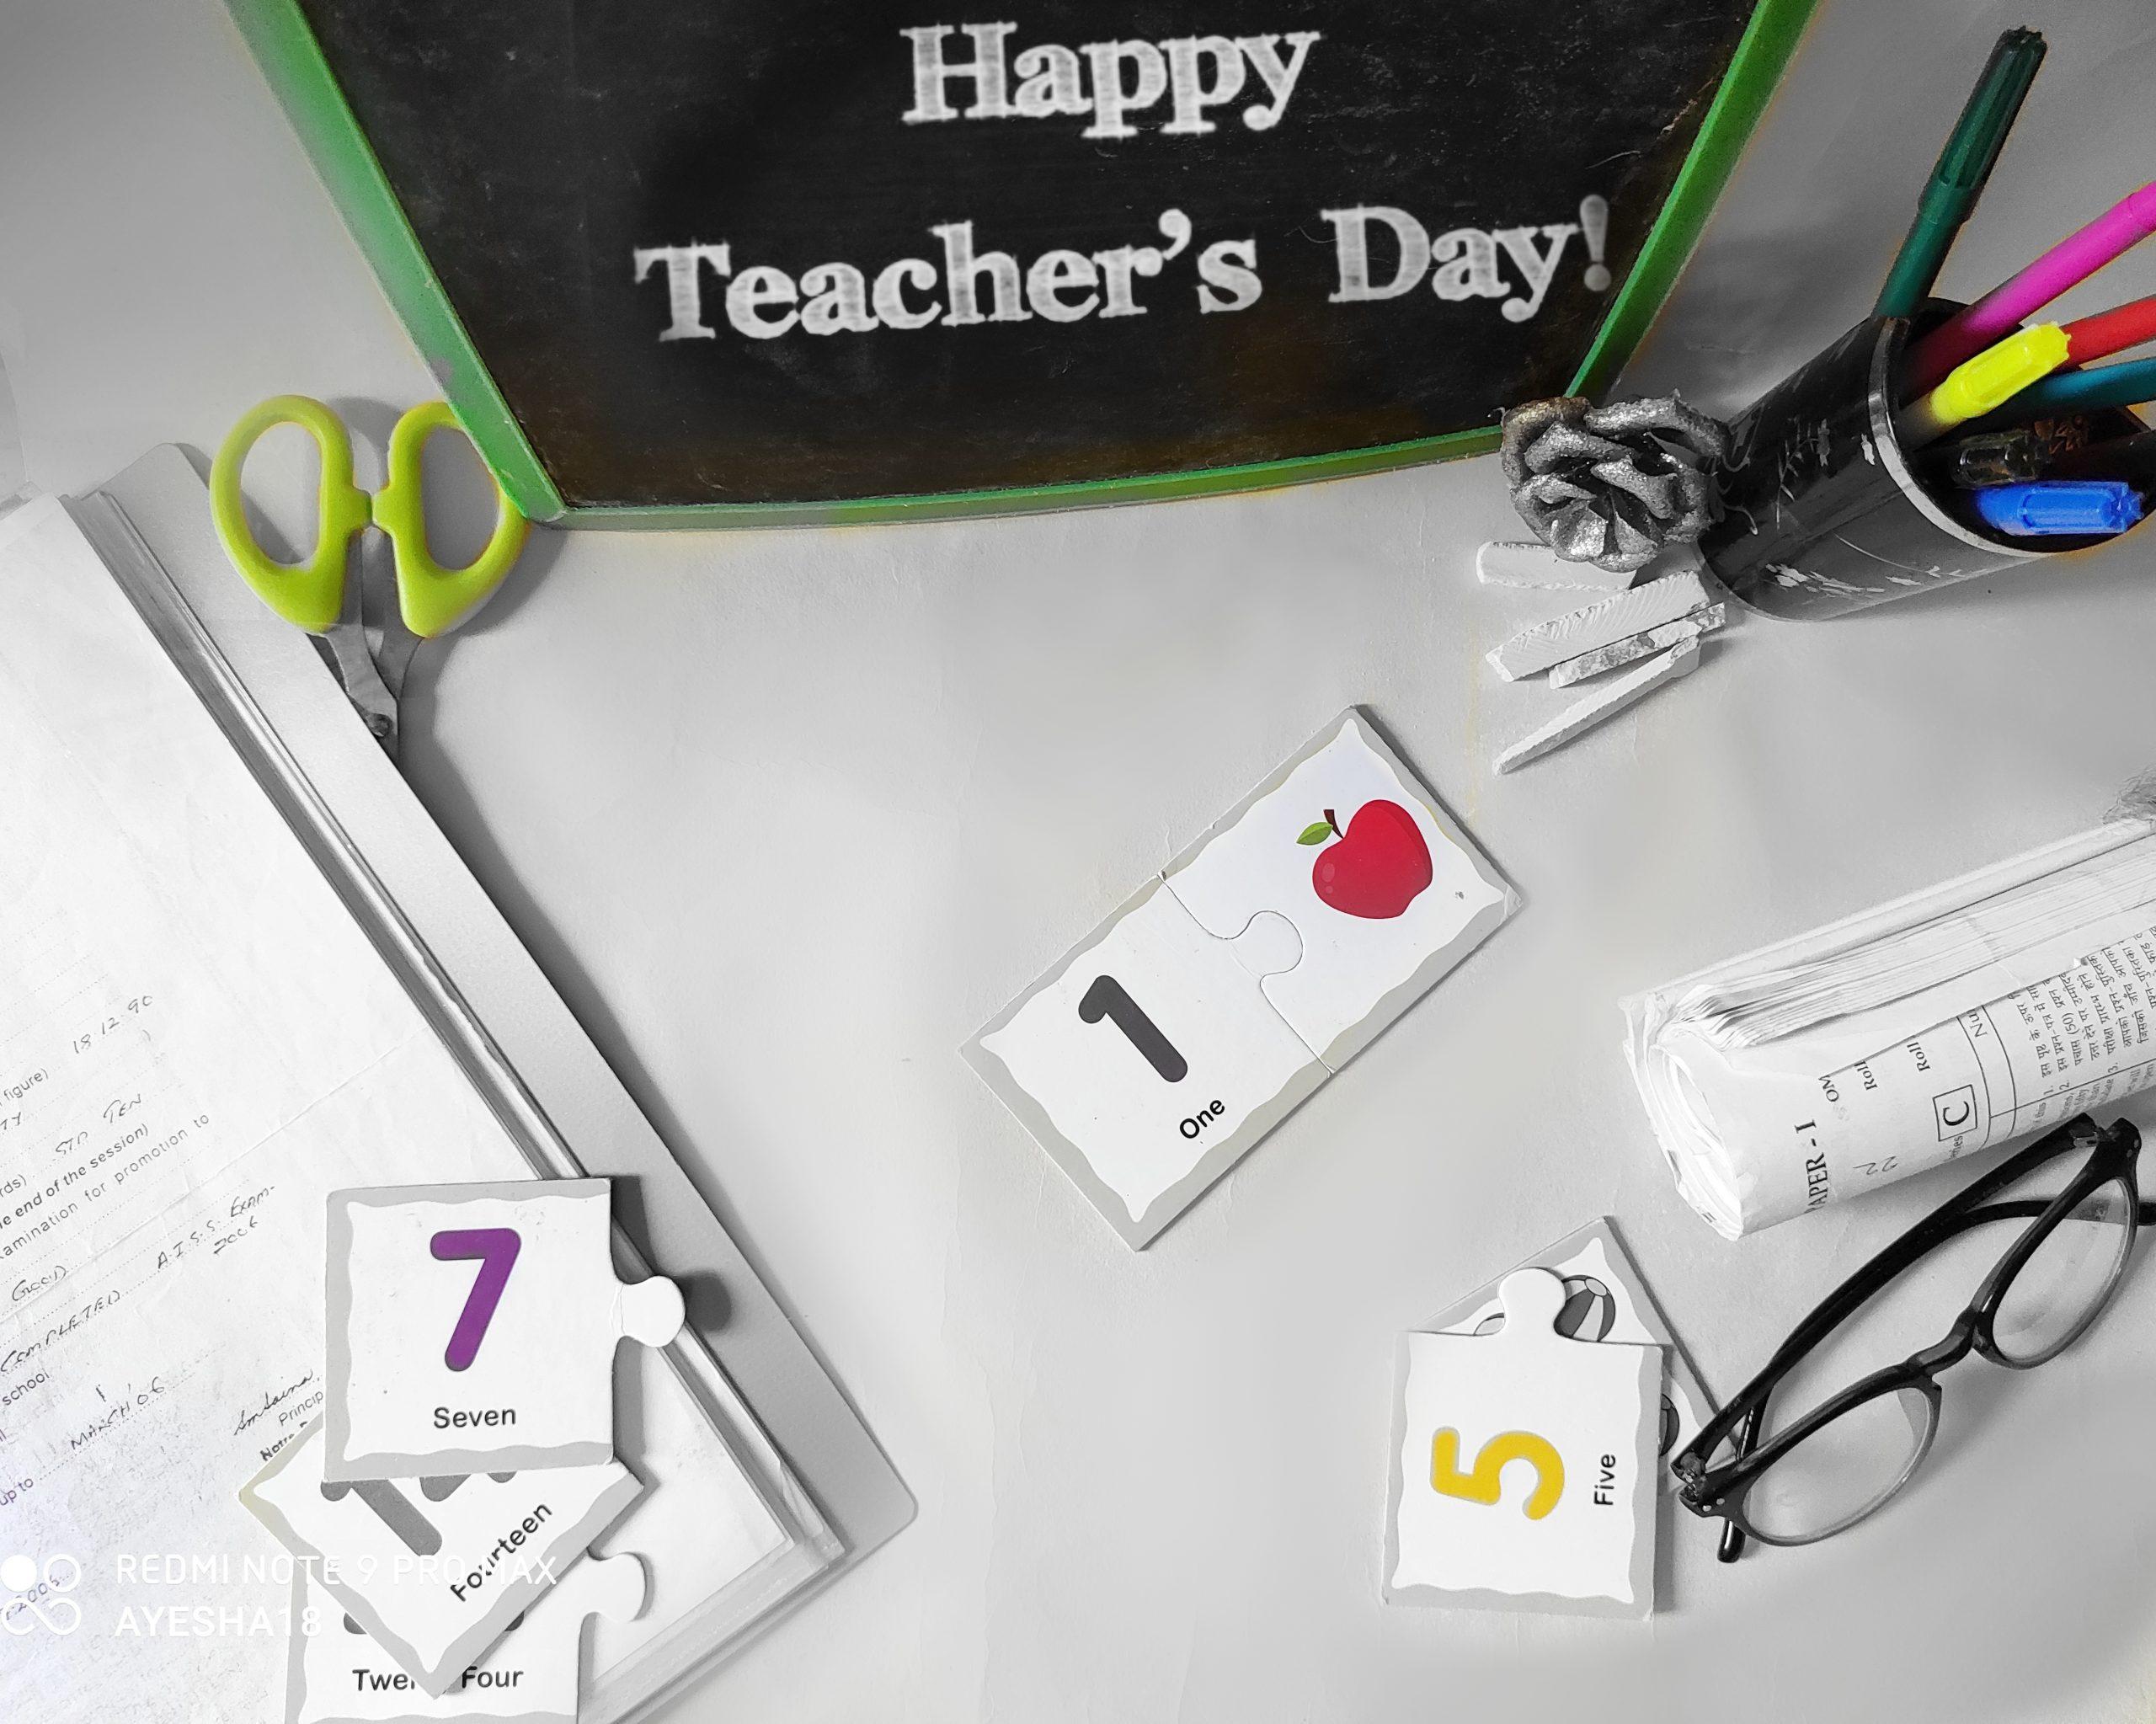 A teachers day flat lay